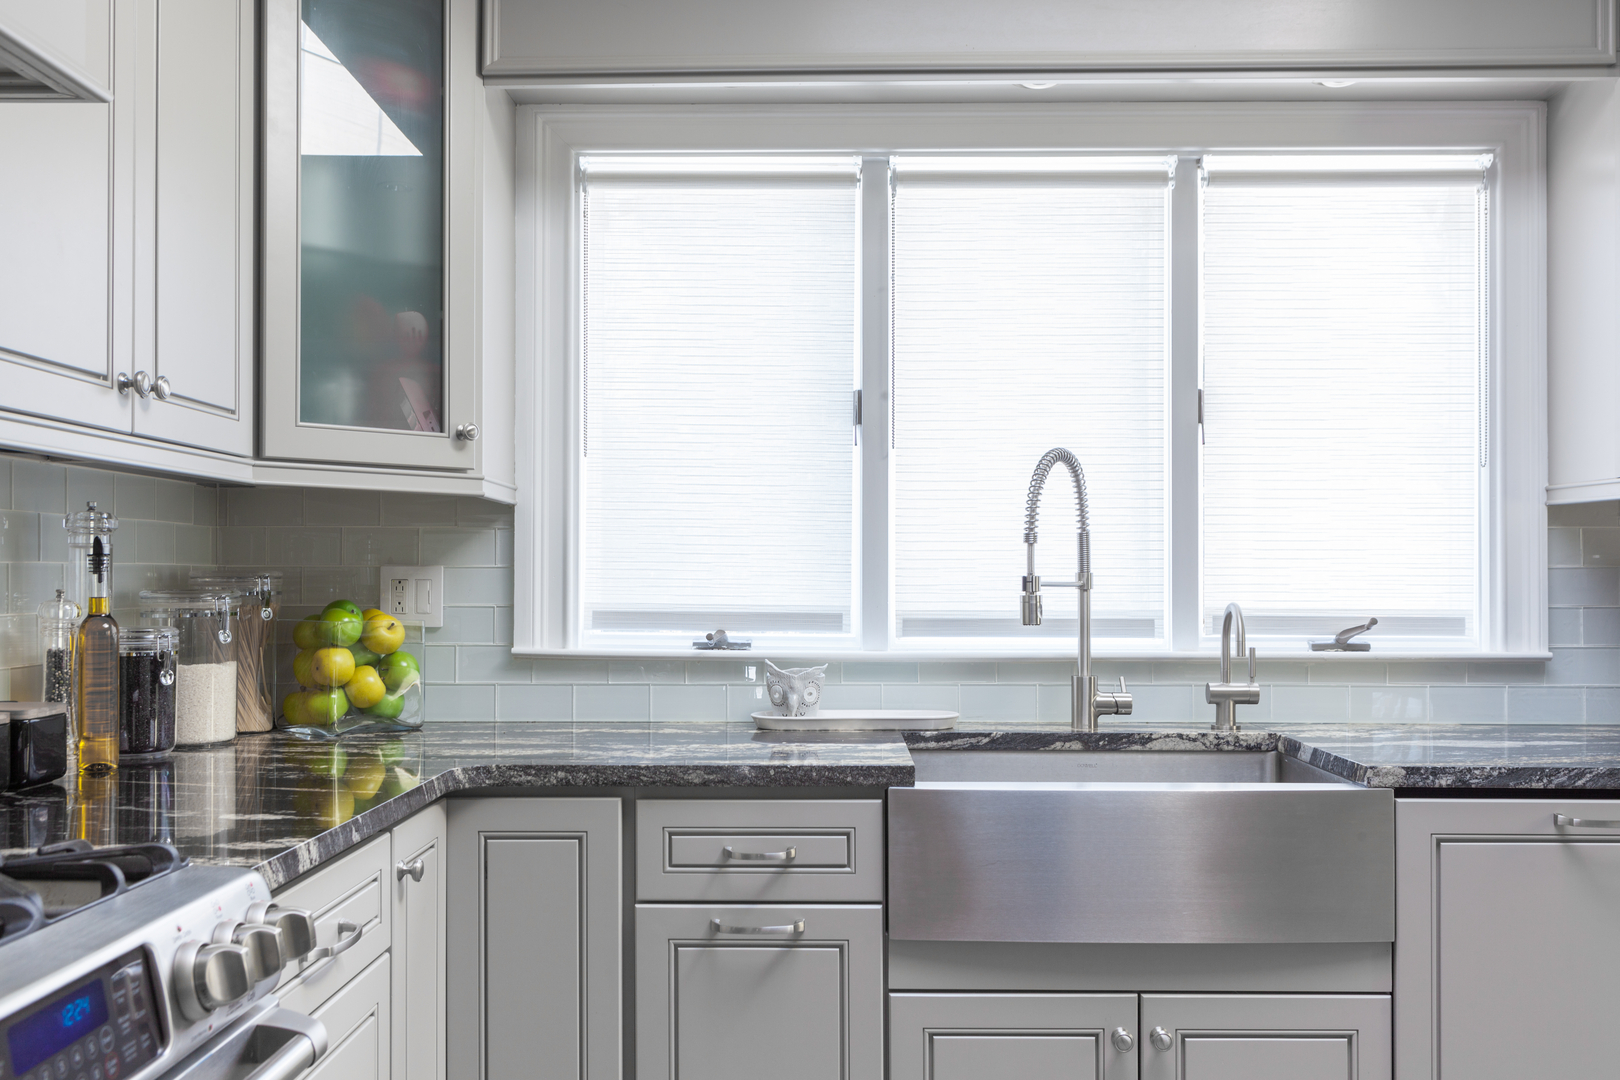 greige kitchen cabinets idea | 1yellowpage